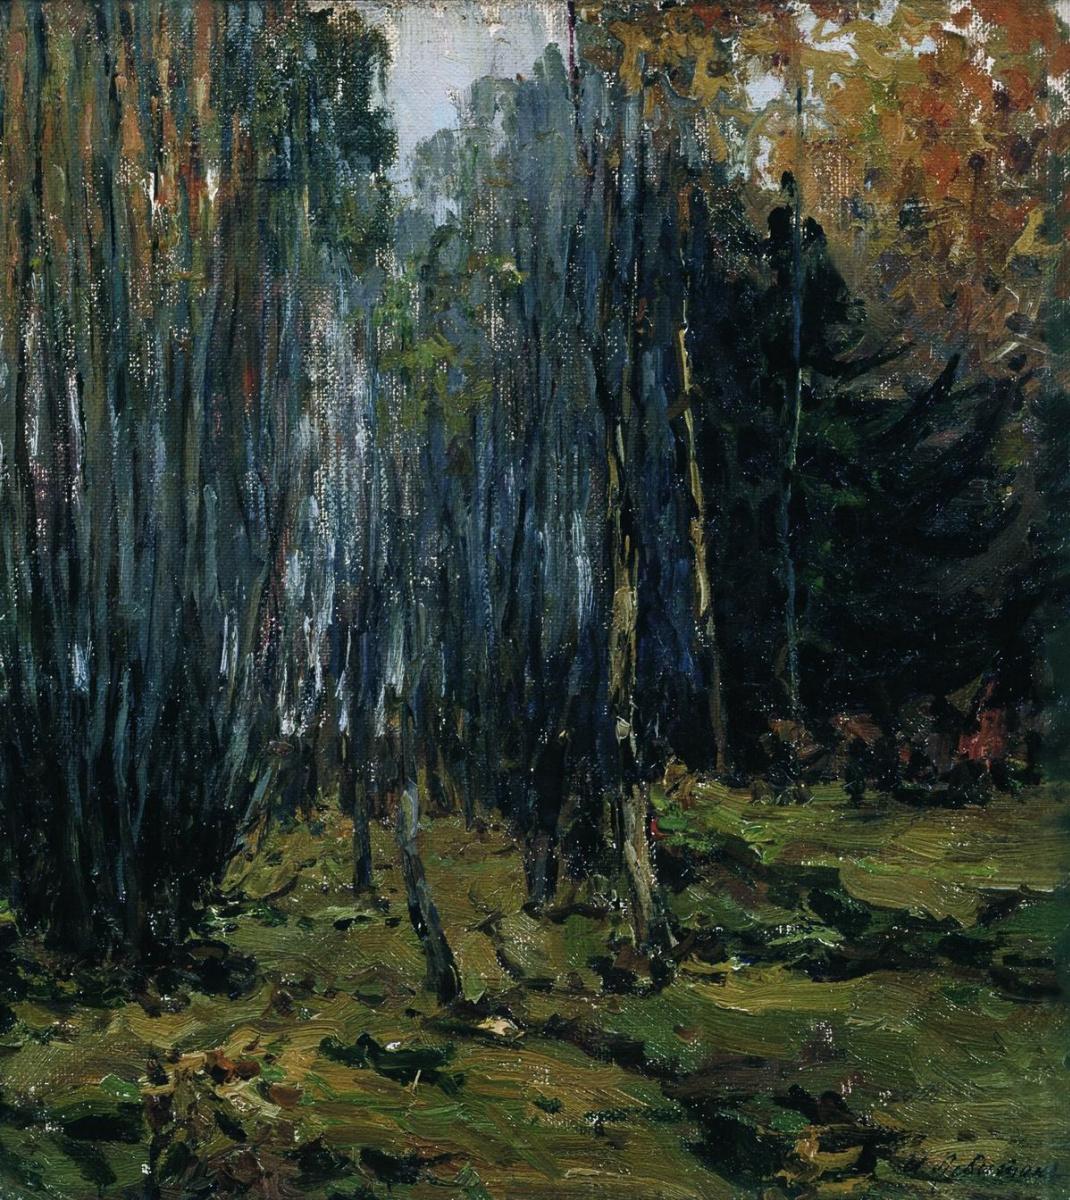 Isaac Levitan. Autumn forest